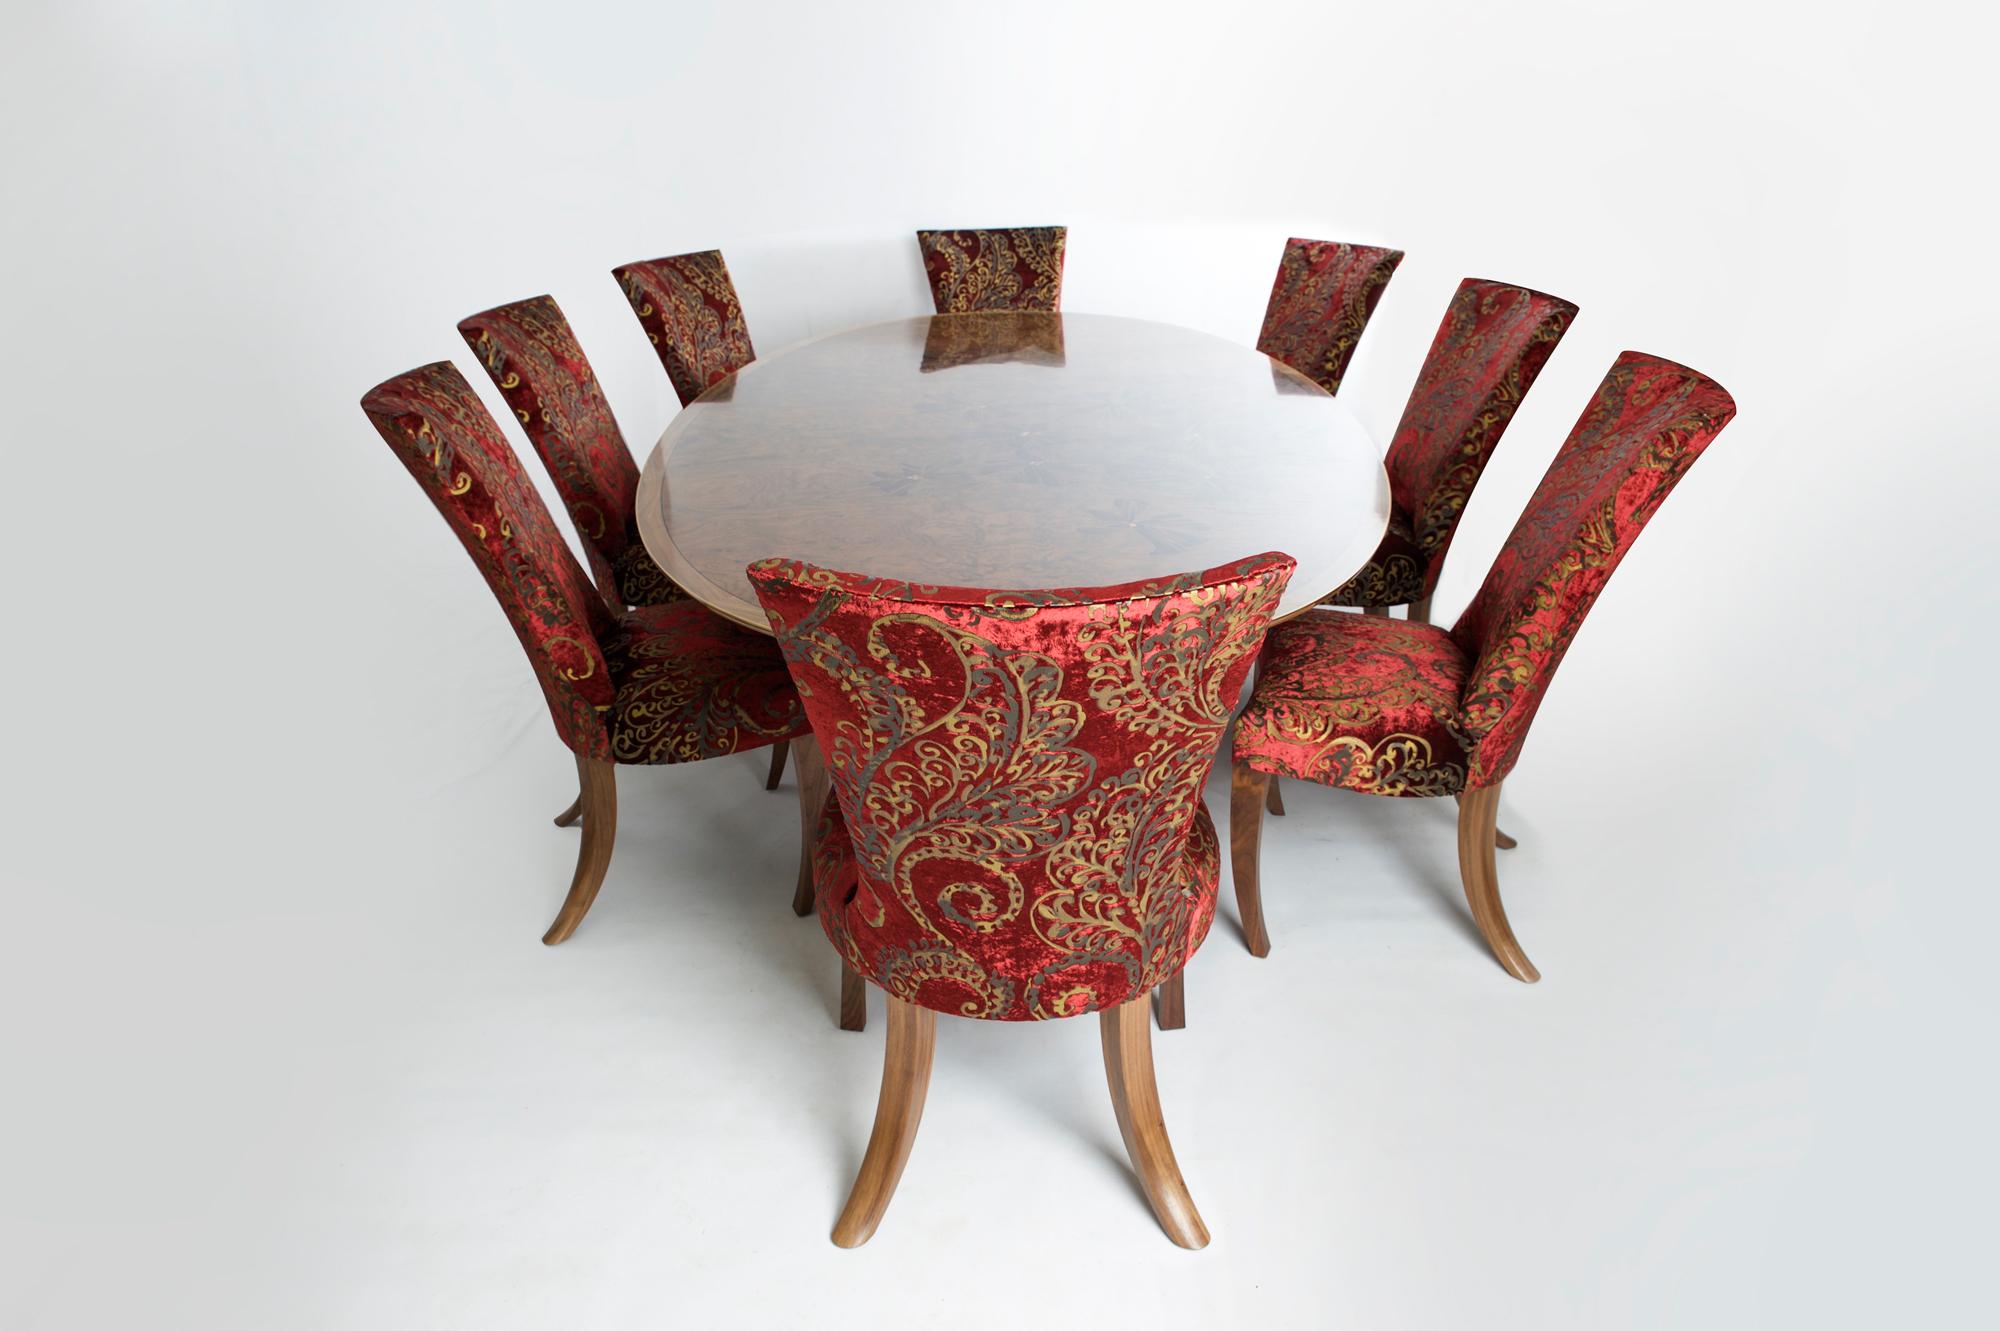 dubai-dining-table-chairs-3